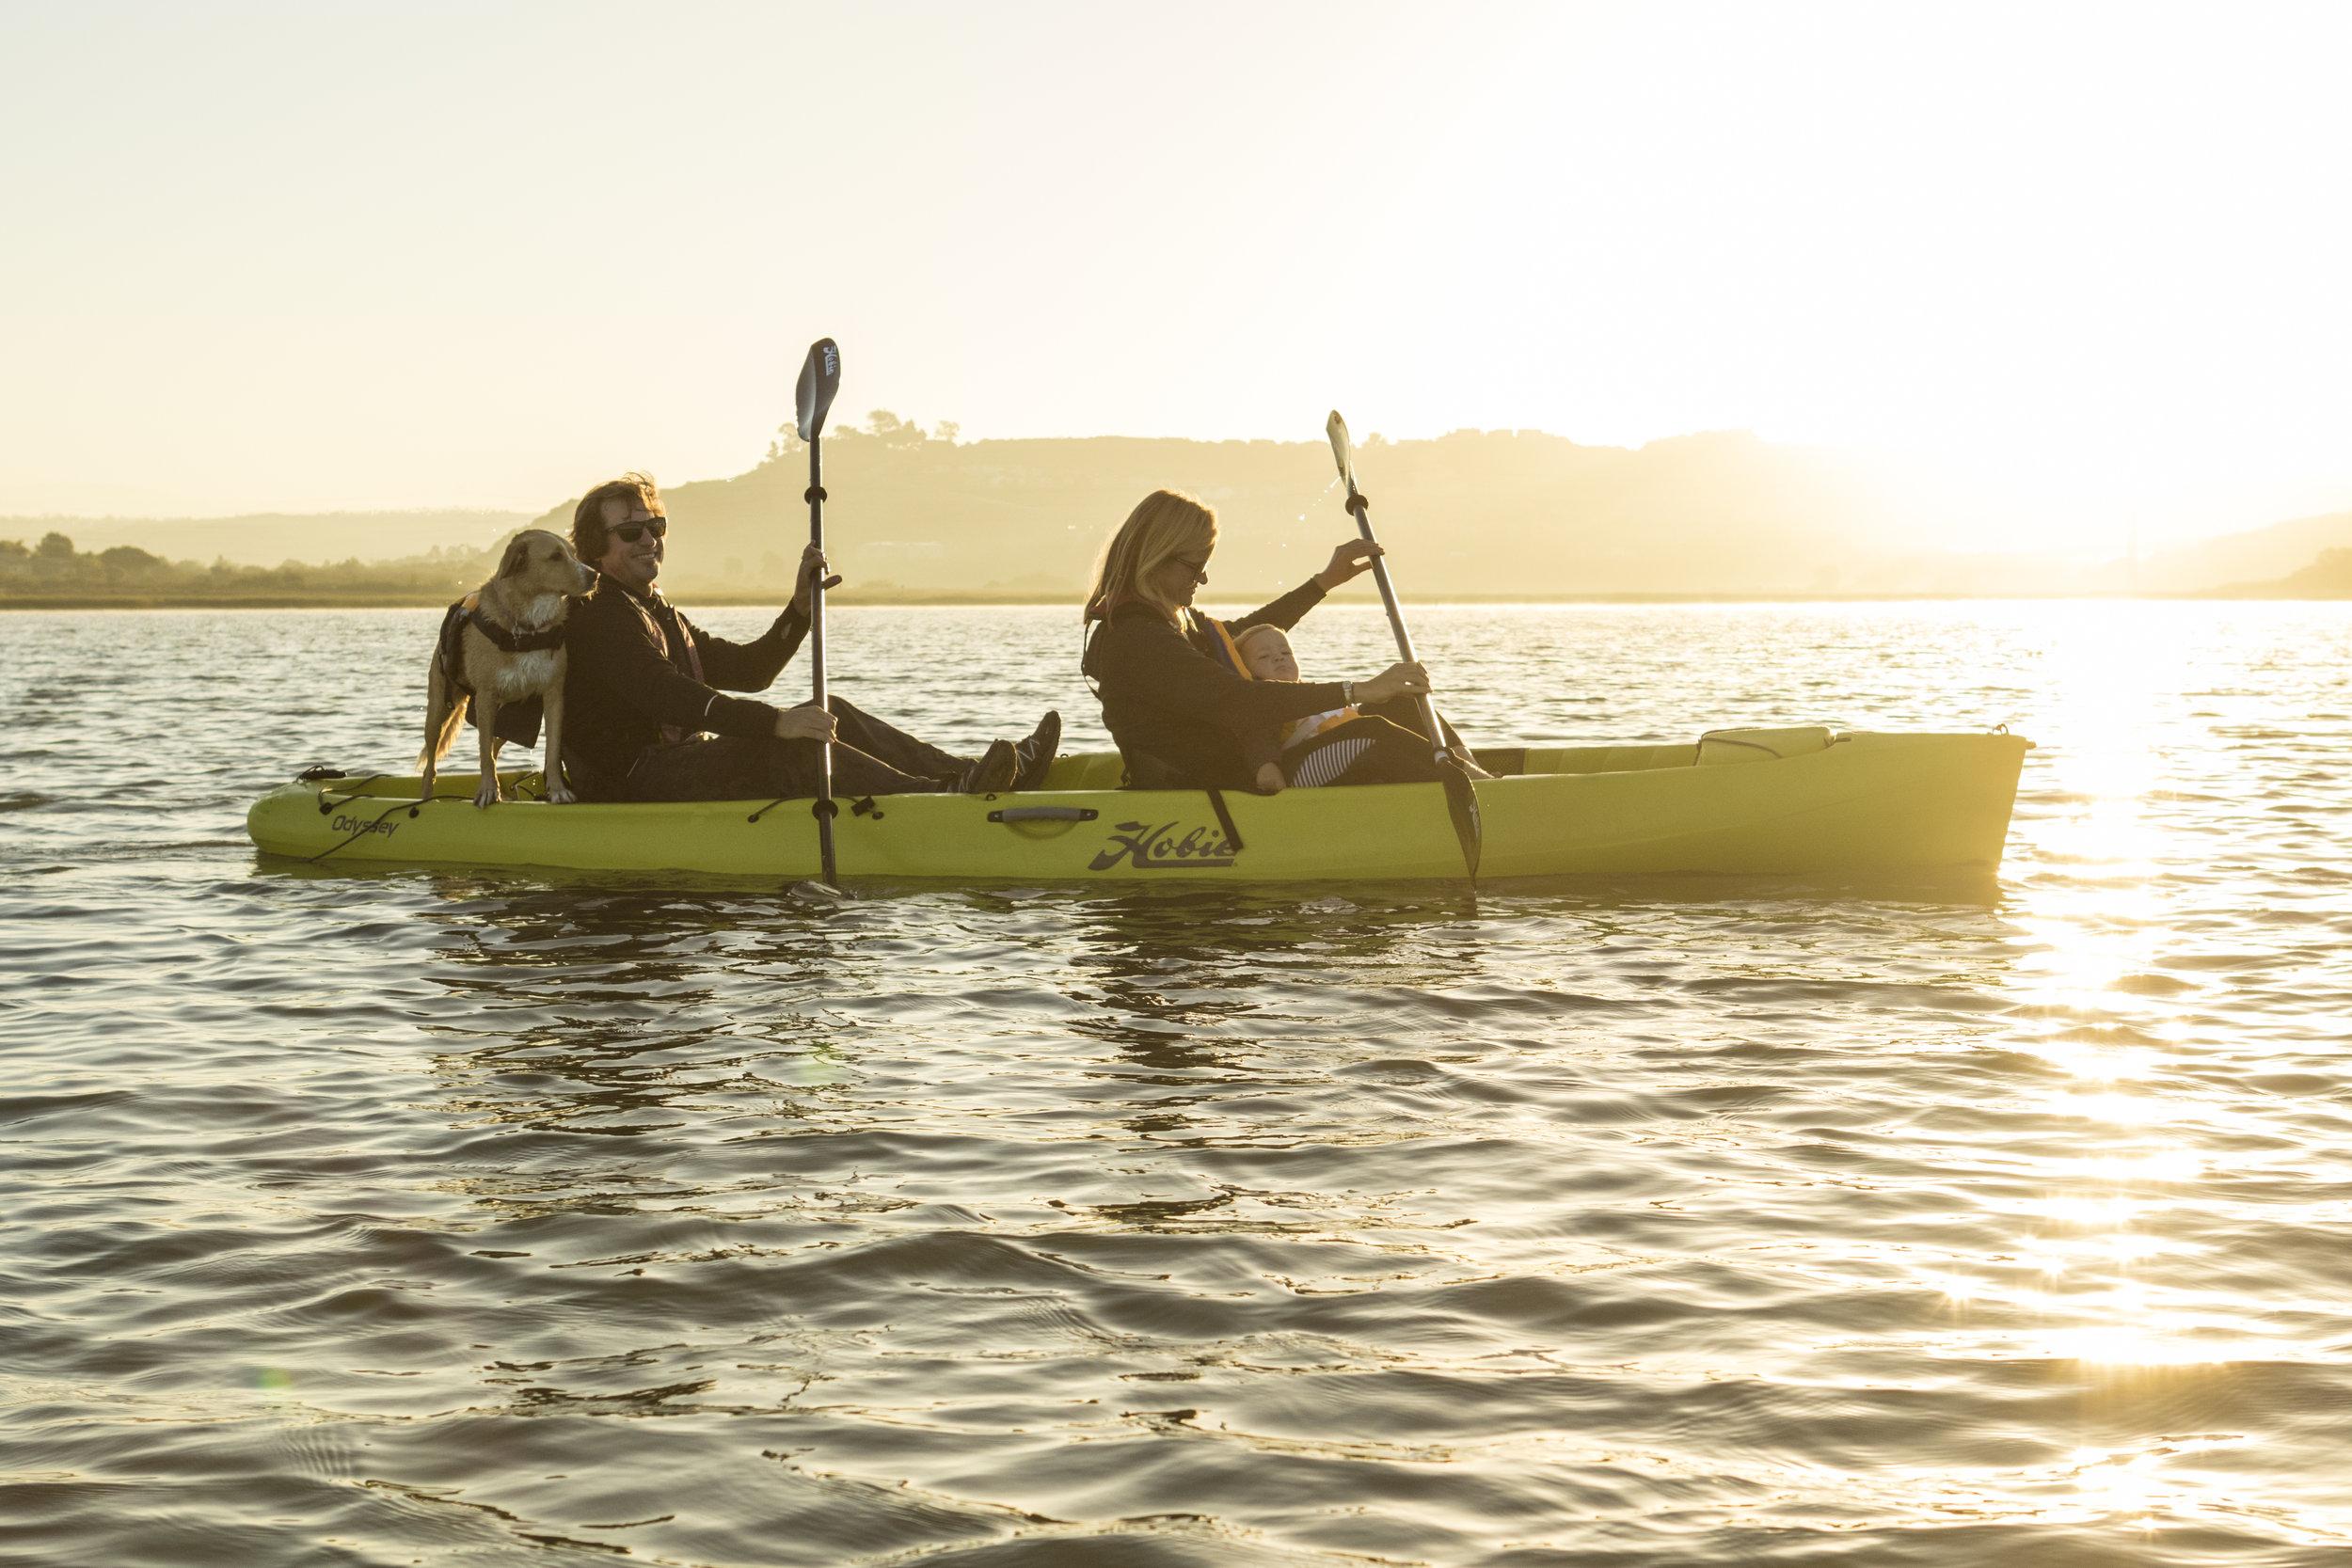 Odyssey_action_family_seagrass_lagoon_jim_dog_sunrise.jpg